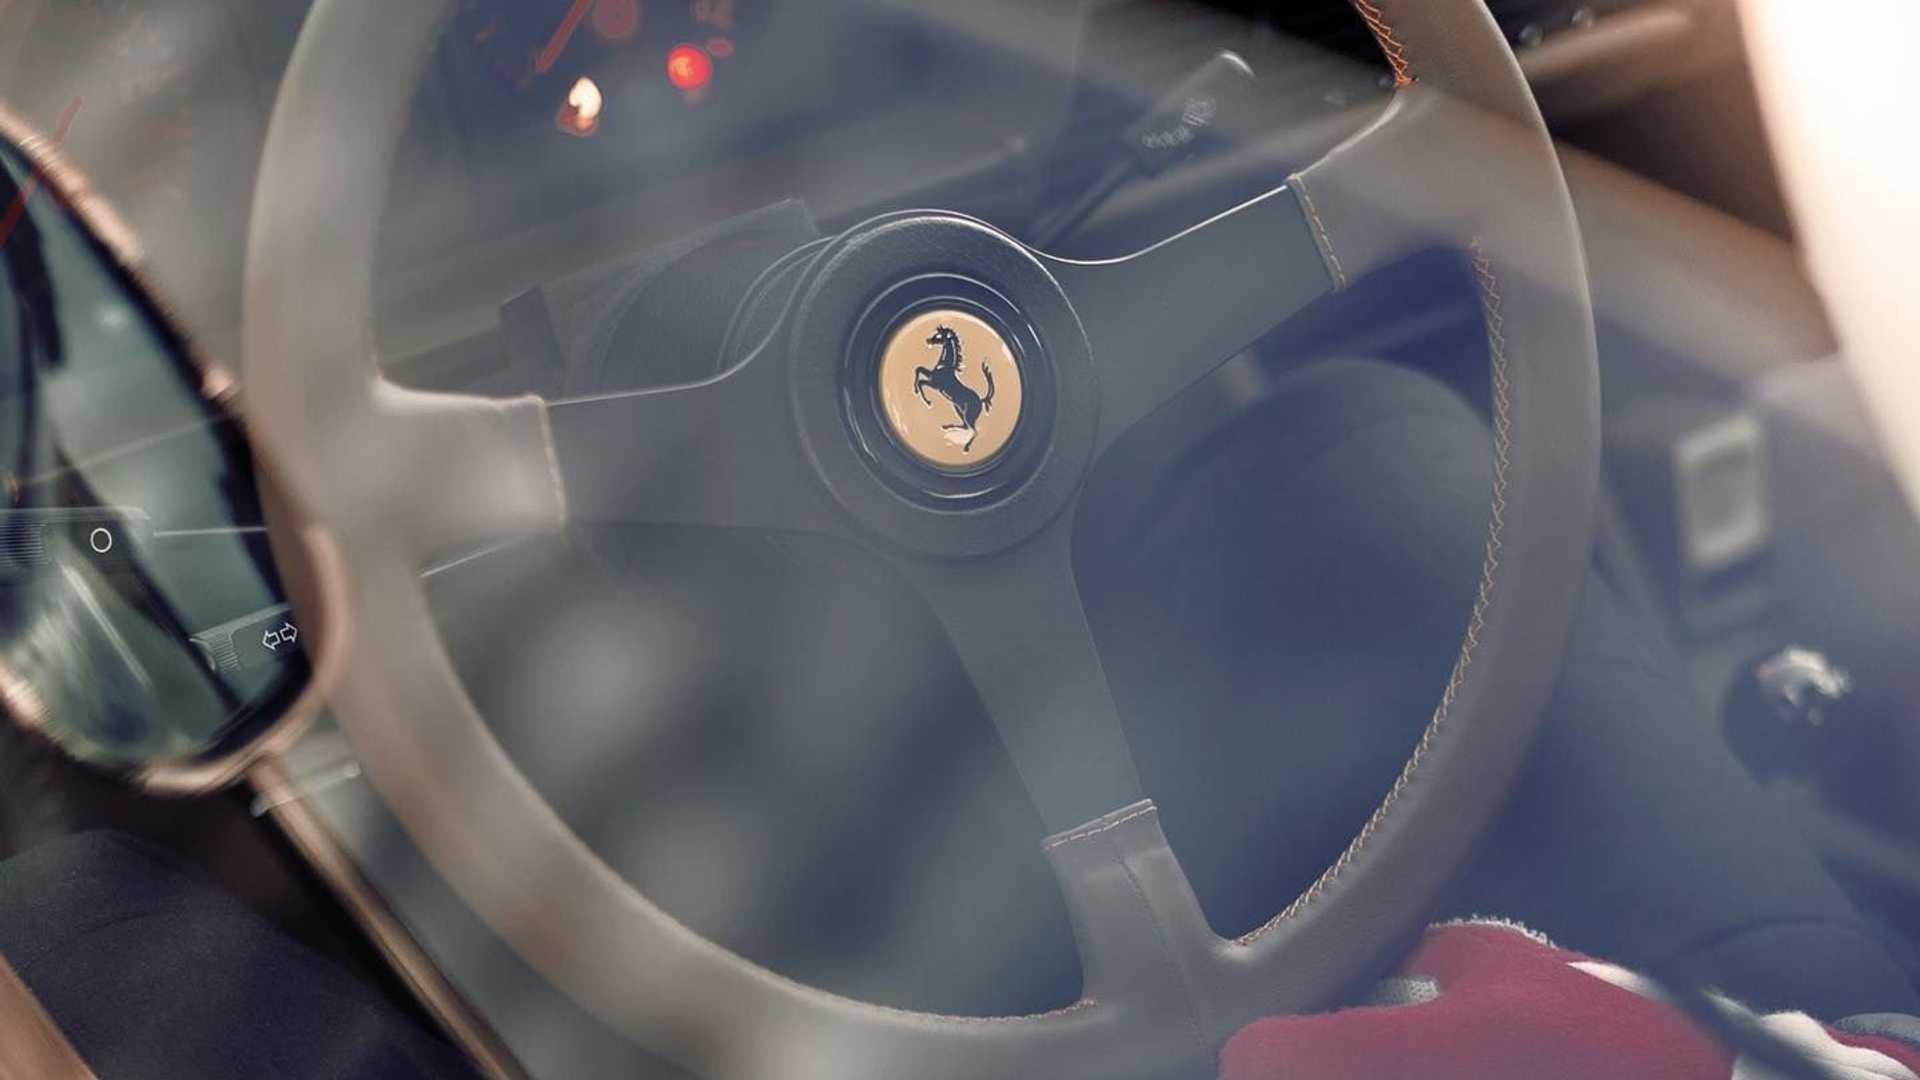 Ferrari-Testarossa-restomod-by-Officine-Fioravanti-11